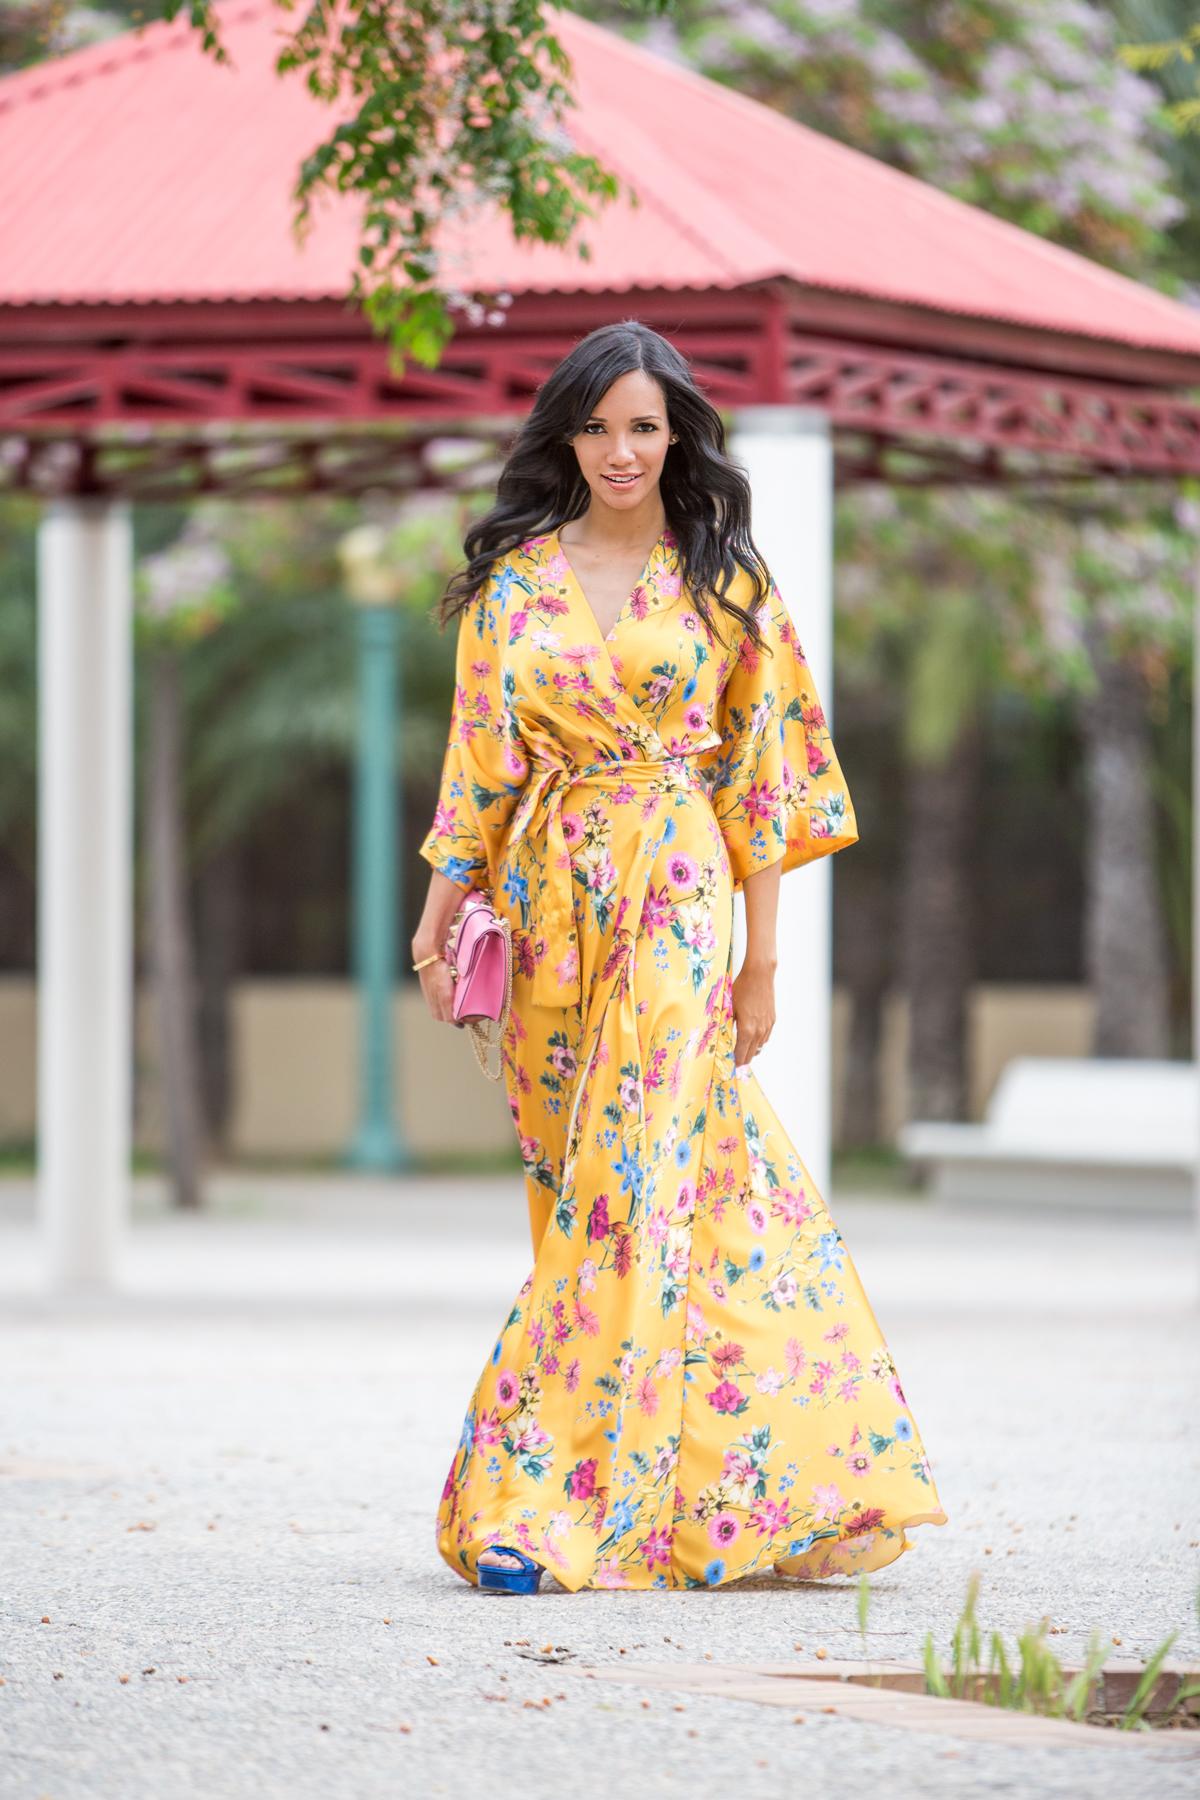 BBC Personal Shopper Vestido Floral Etxart & Panno